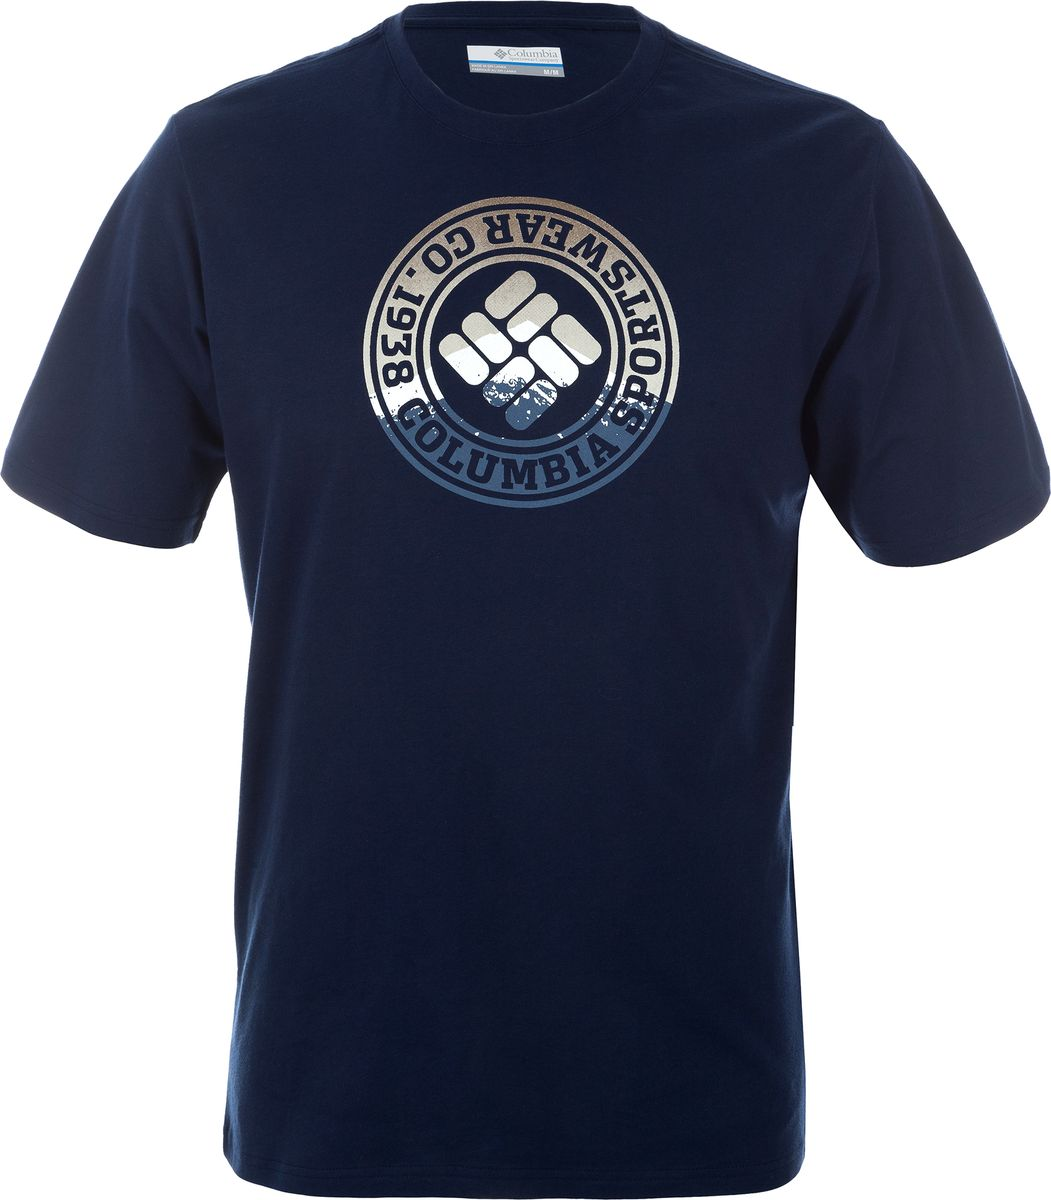 Футболка мужская Columbia CSC Tried and True SS Tee, цвет: темно-синий. 1546551-464. Размер XXL (56/58)